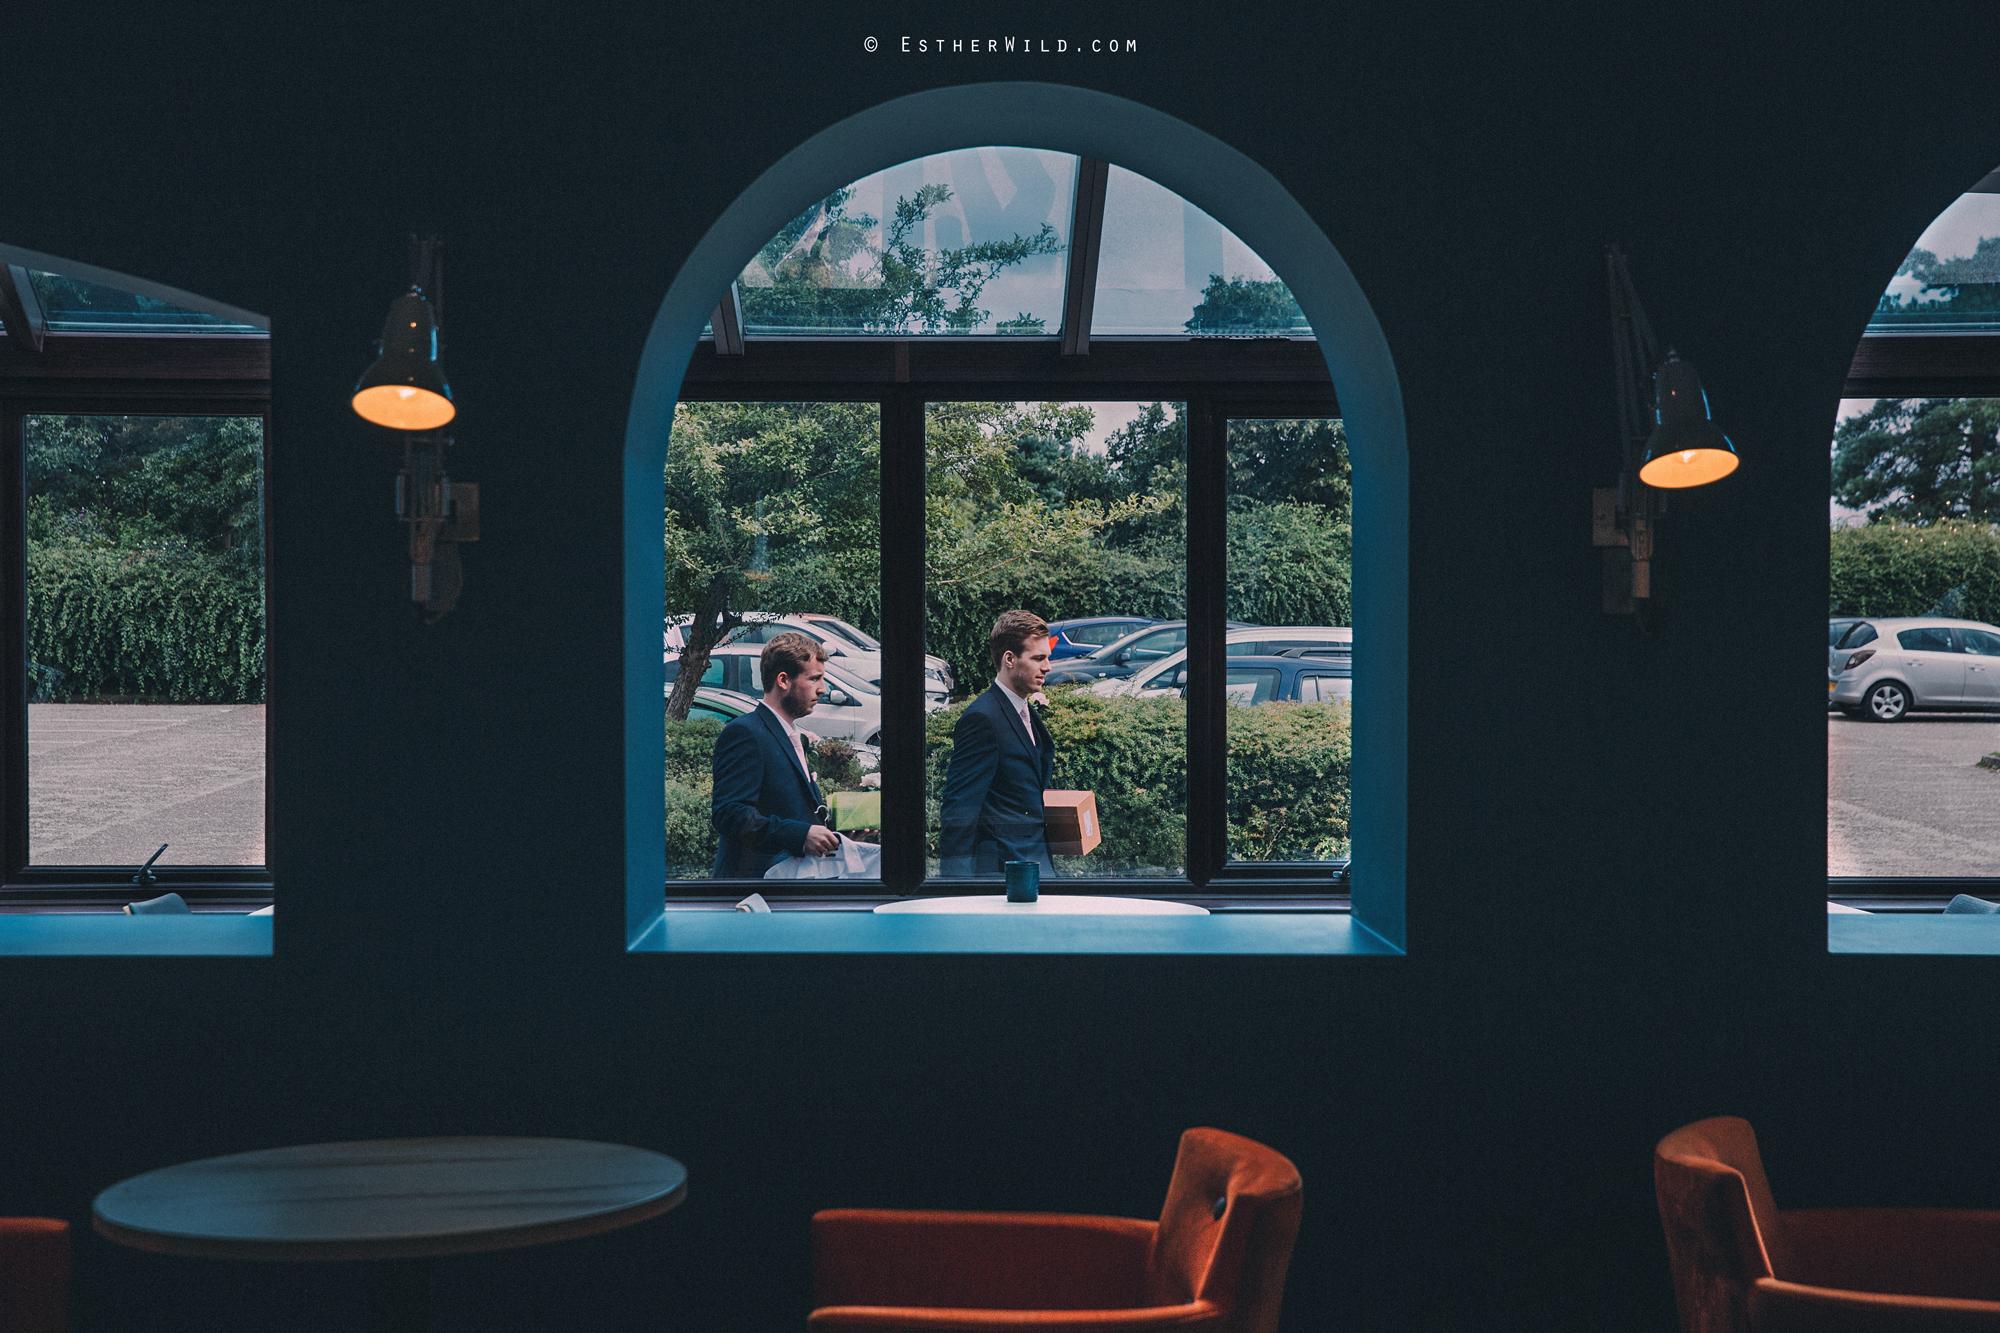 0817_Holiday_Inn_Norwich_Wedding_Photography_Esther_Wild_IMG_0174-1.jpg